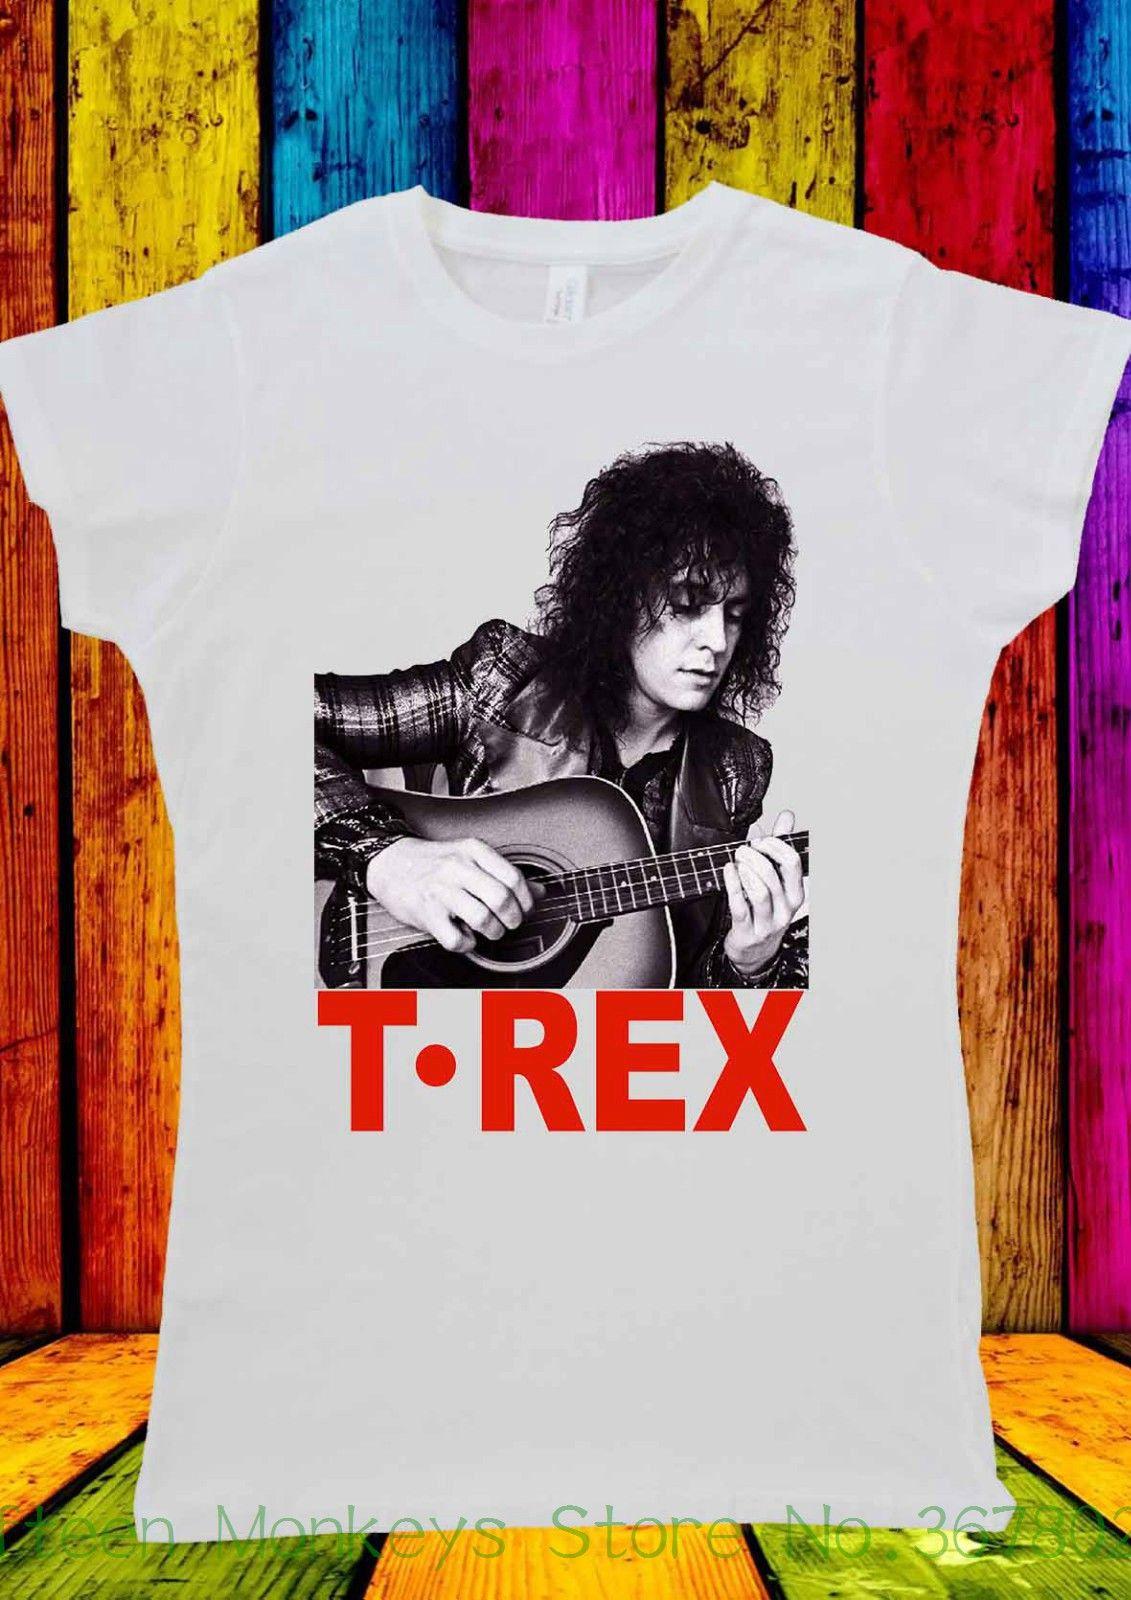 9bf0bfed9 Women S Tee Marc Bolan T Rex Slider English T Shirt Men Women Unisex 123  New Women S T Shirts Tourist Shirts Of T Shirt From Fifteenmonkeysstore